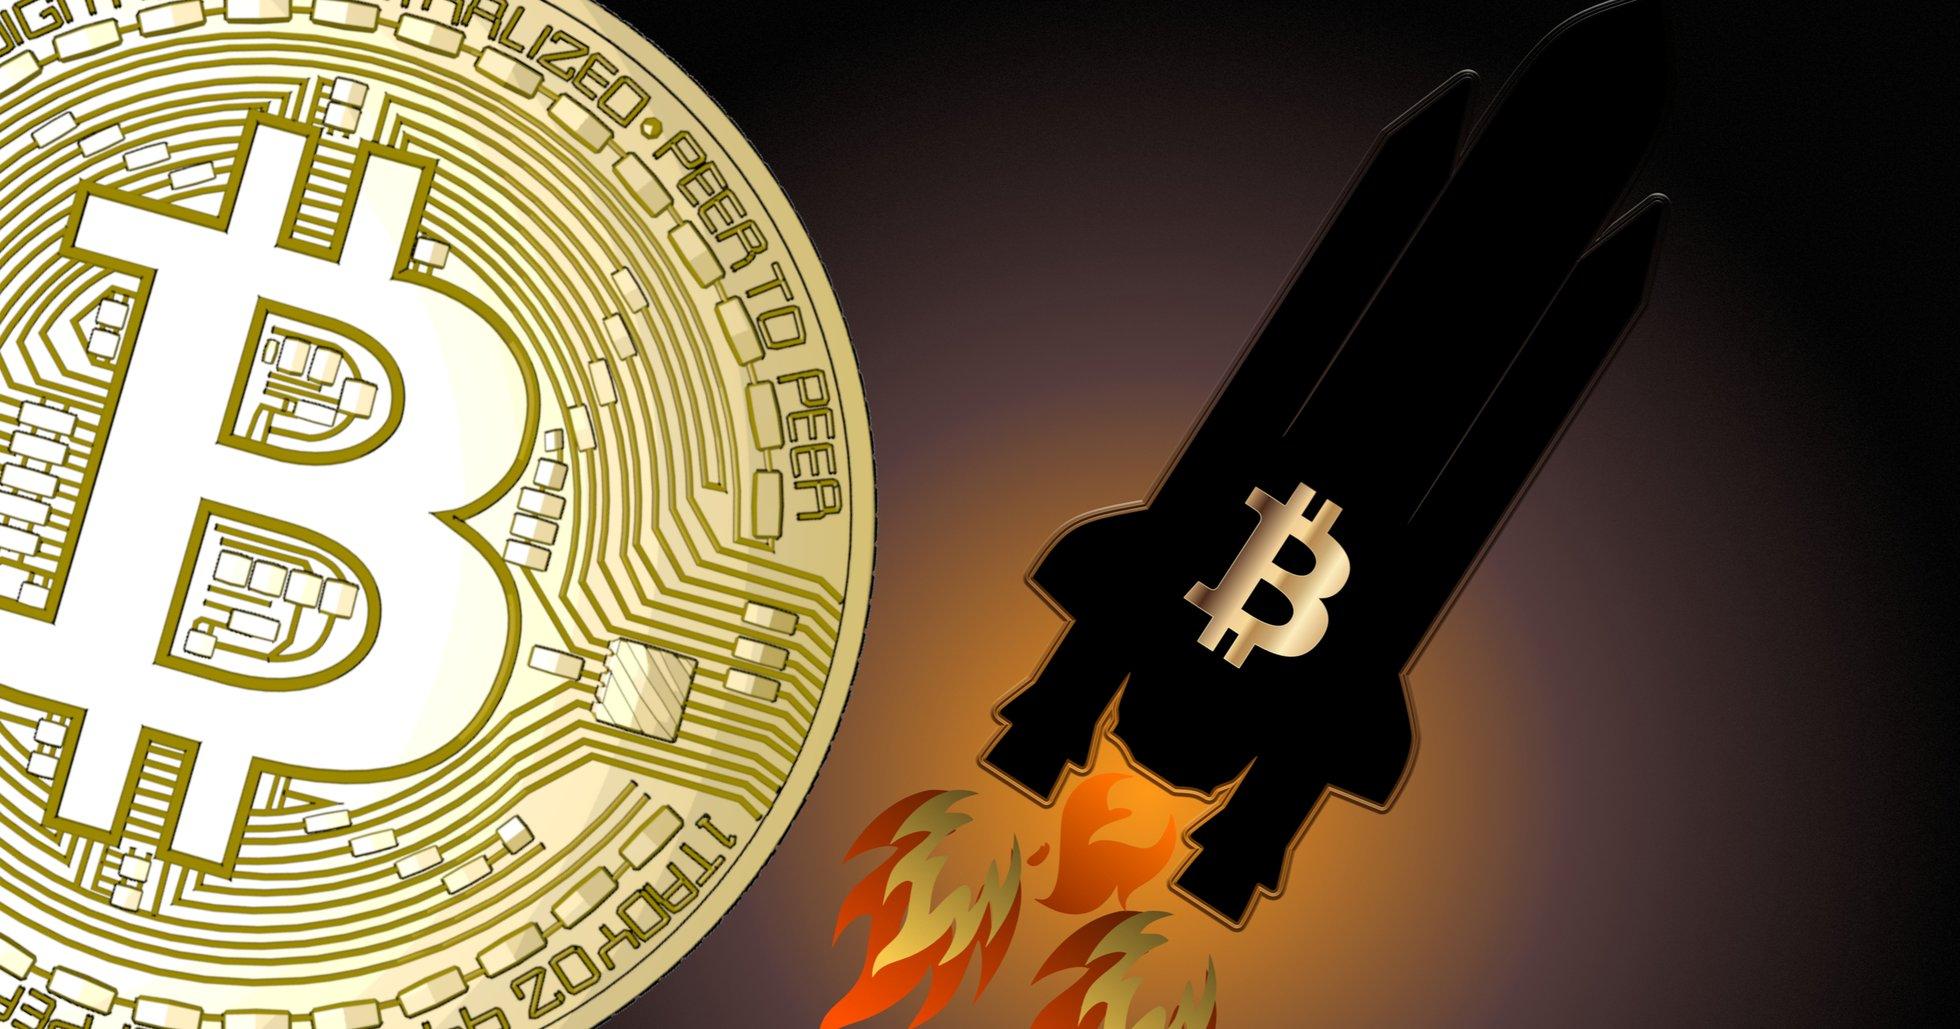 Bitcoinpriset över 7 000 dollar igen.